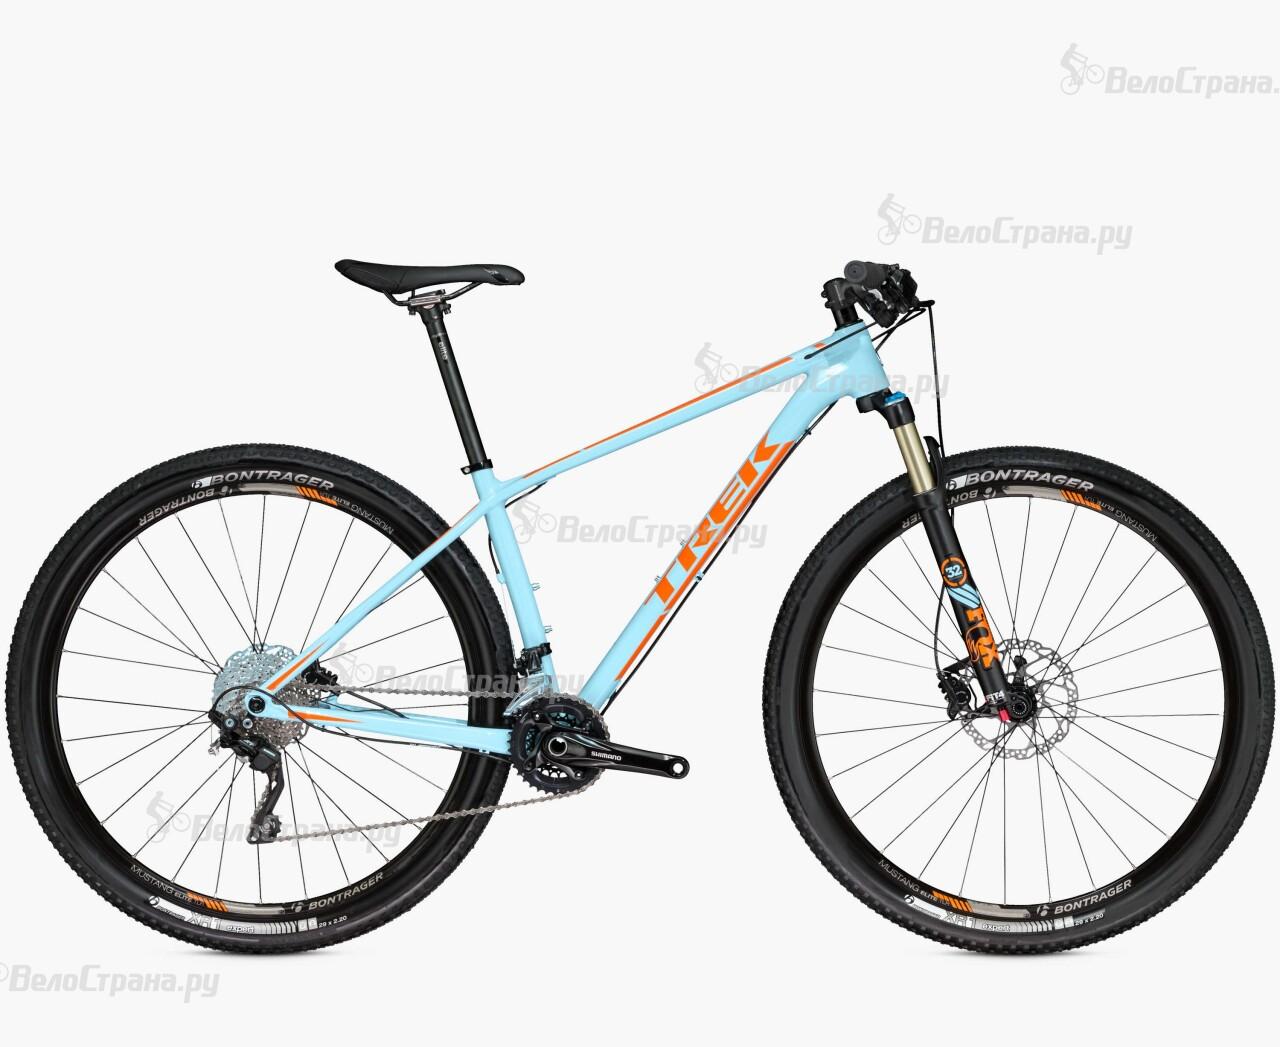 Велосипед Trek Superfly 7 29 (2016) велосипед trek marlin 4 29 2017